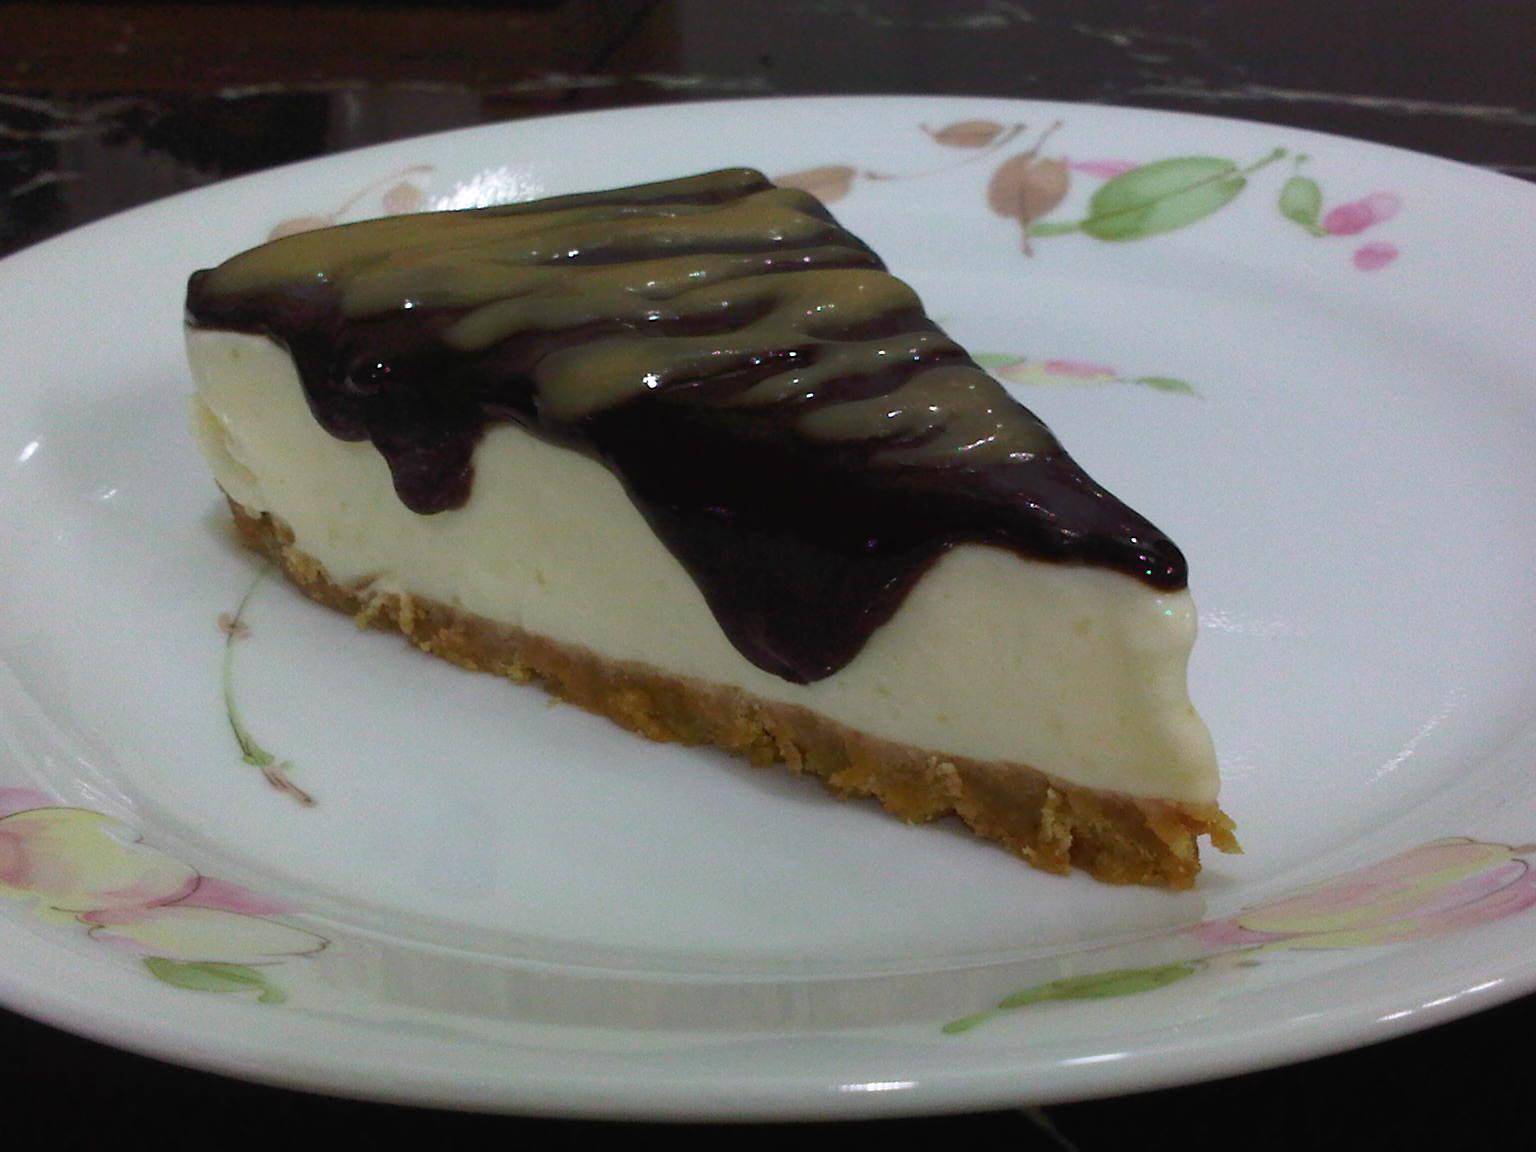 resepi oreo cheese cake  bakar mat gebu transantartica Resepi Oreo Cheesecake Guna Gelatin Enak dan Mudah